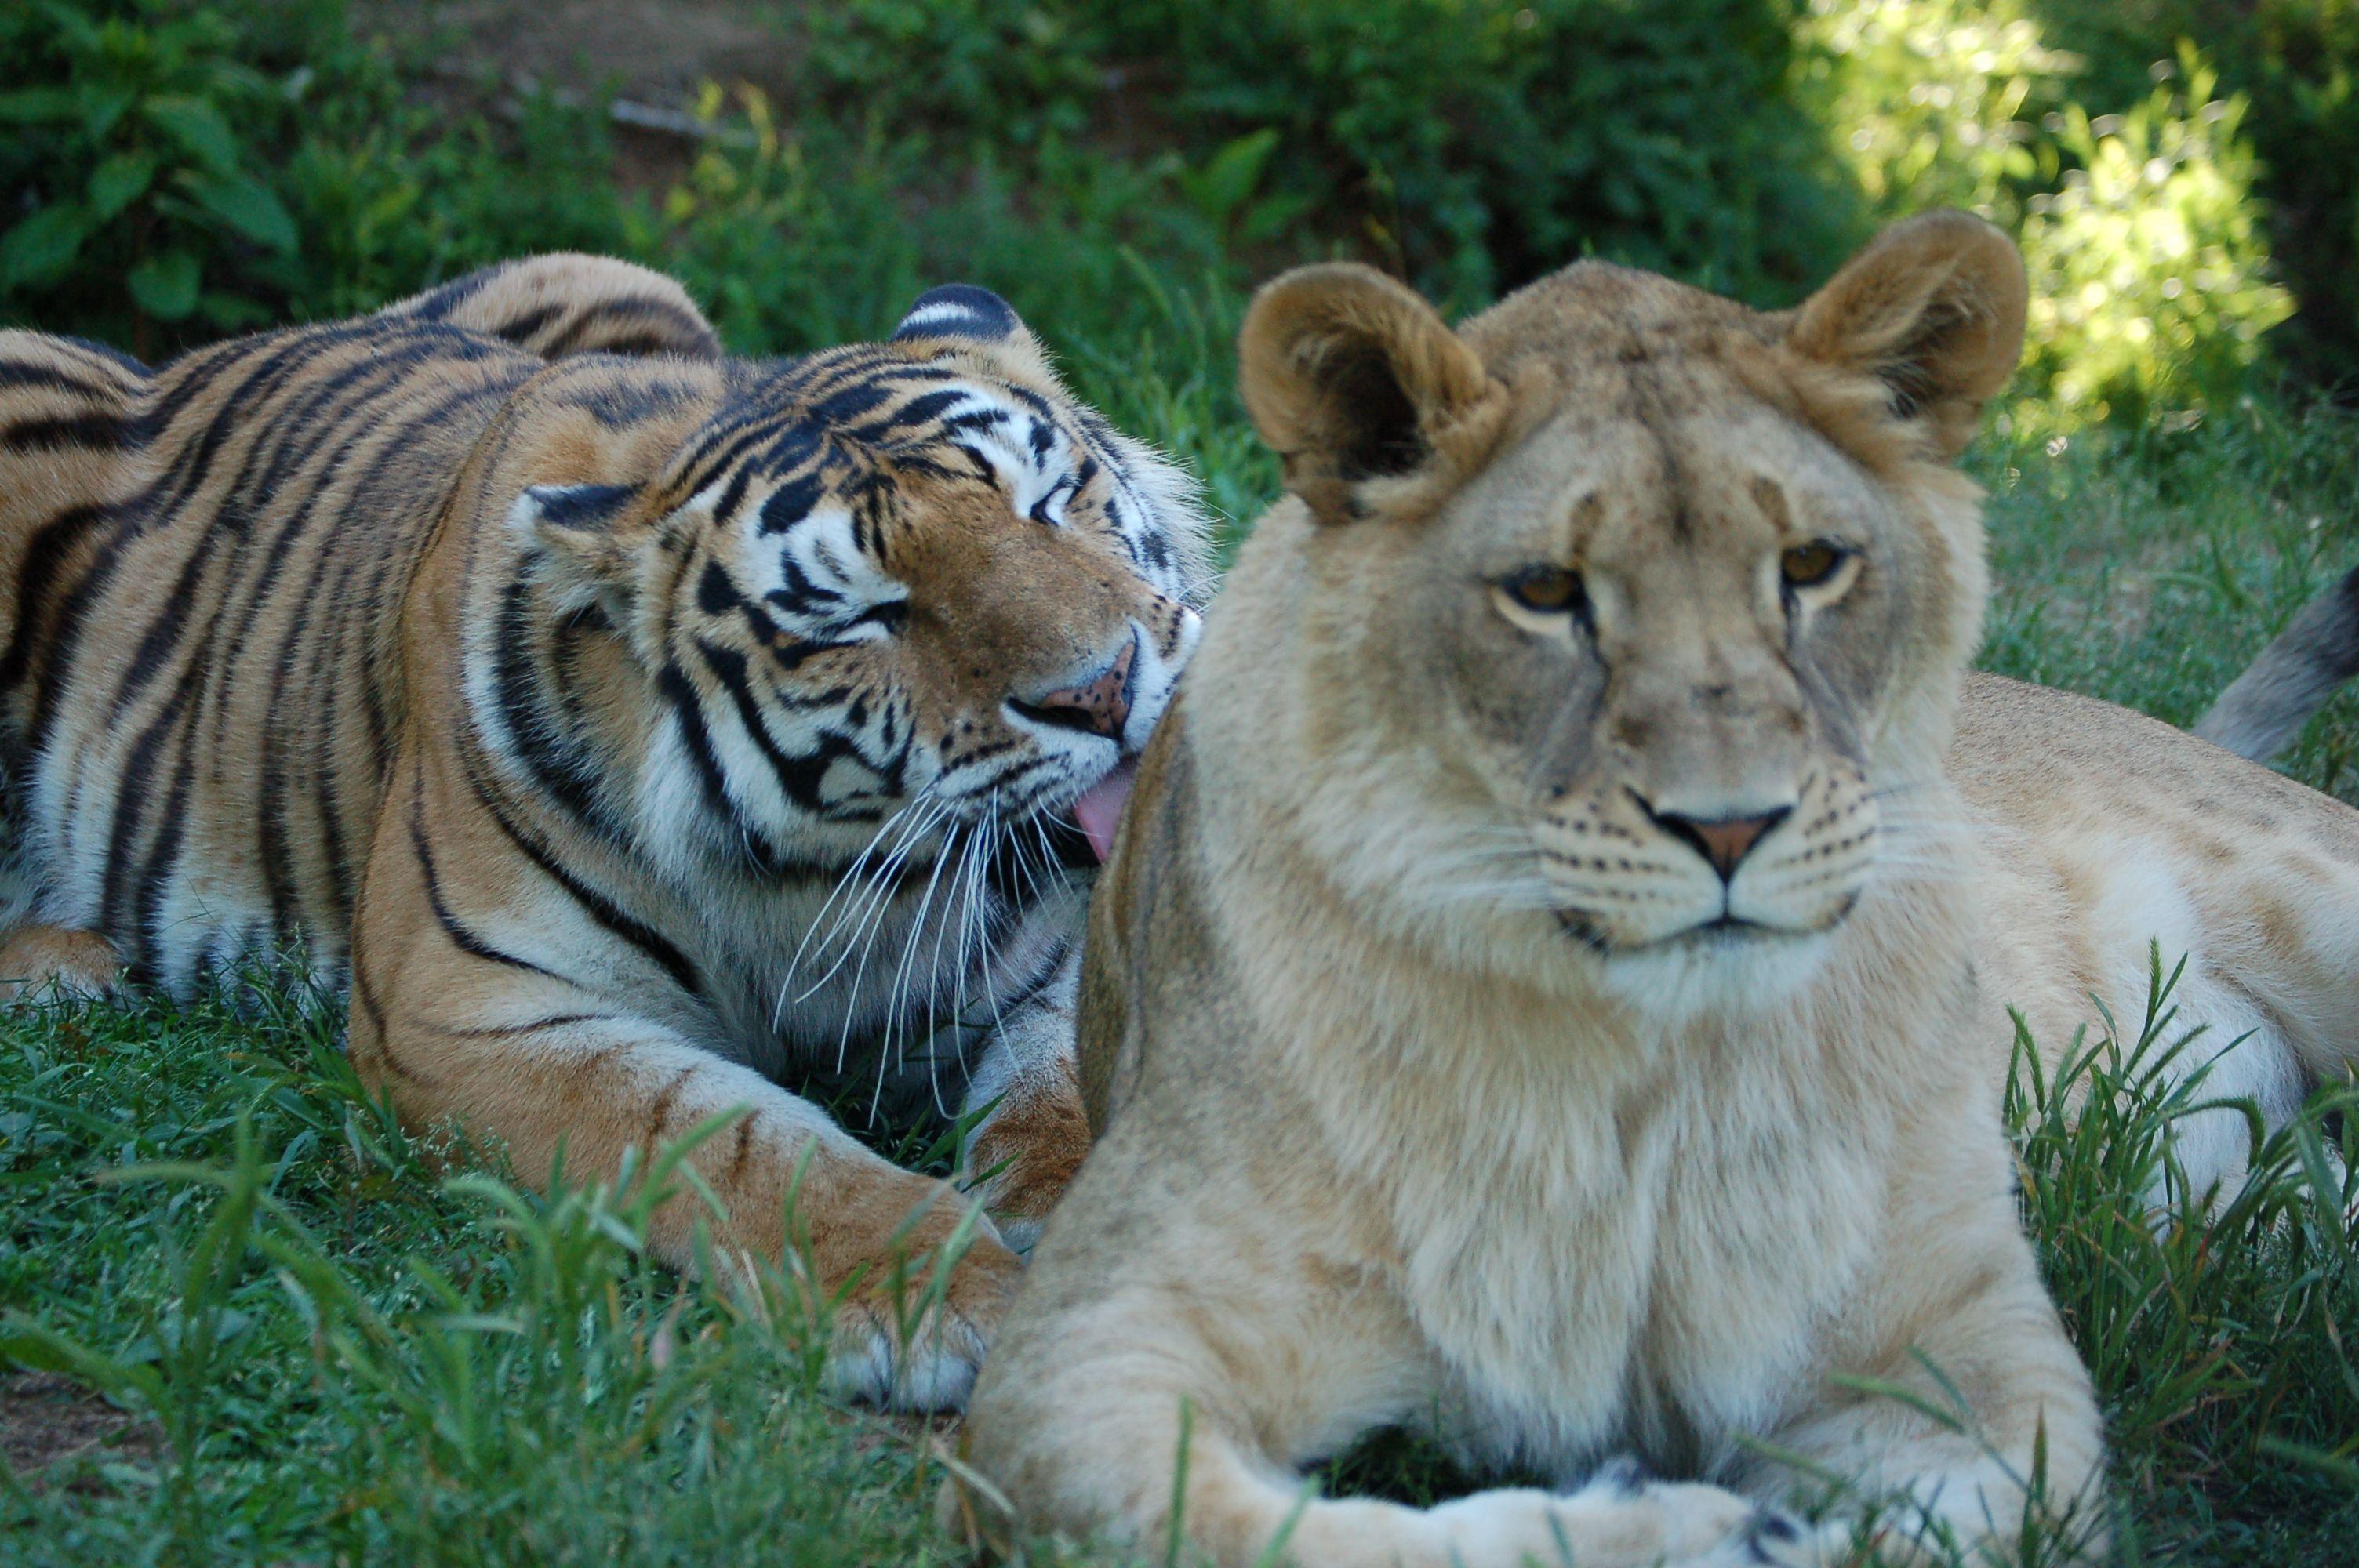 Tiger Lily grooming Liberty